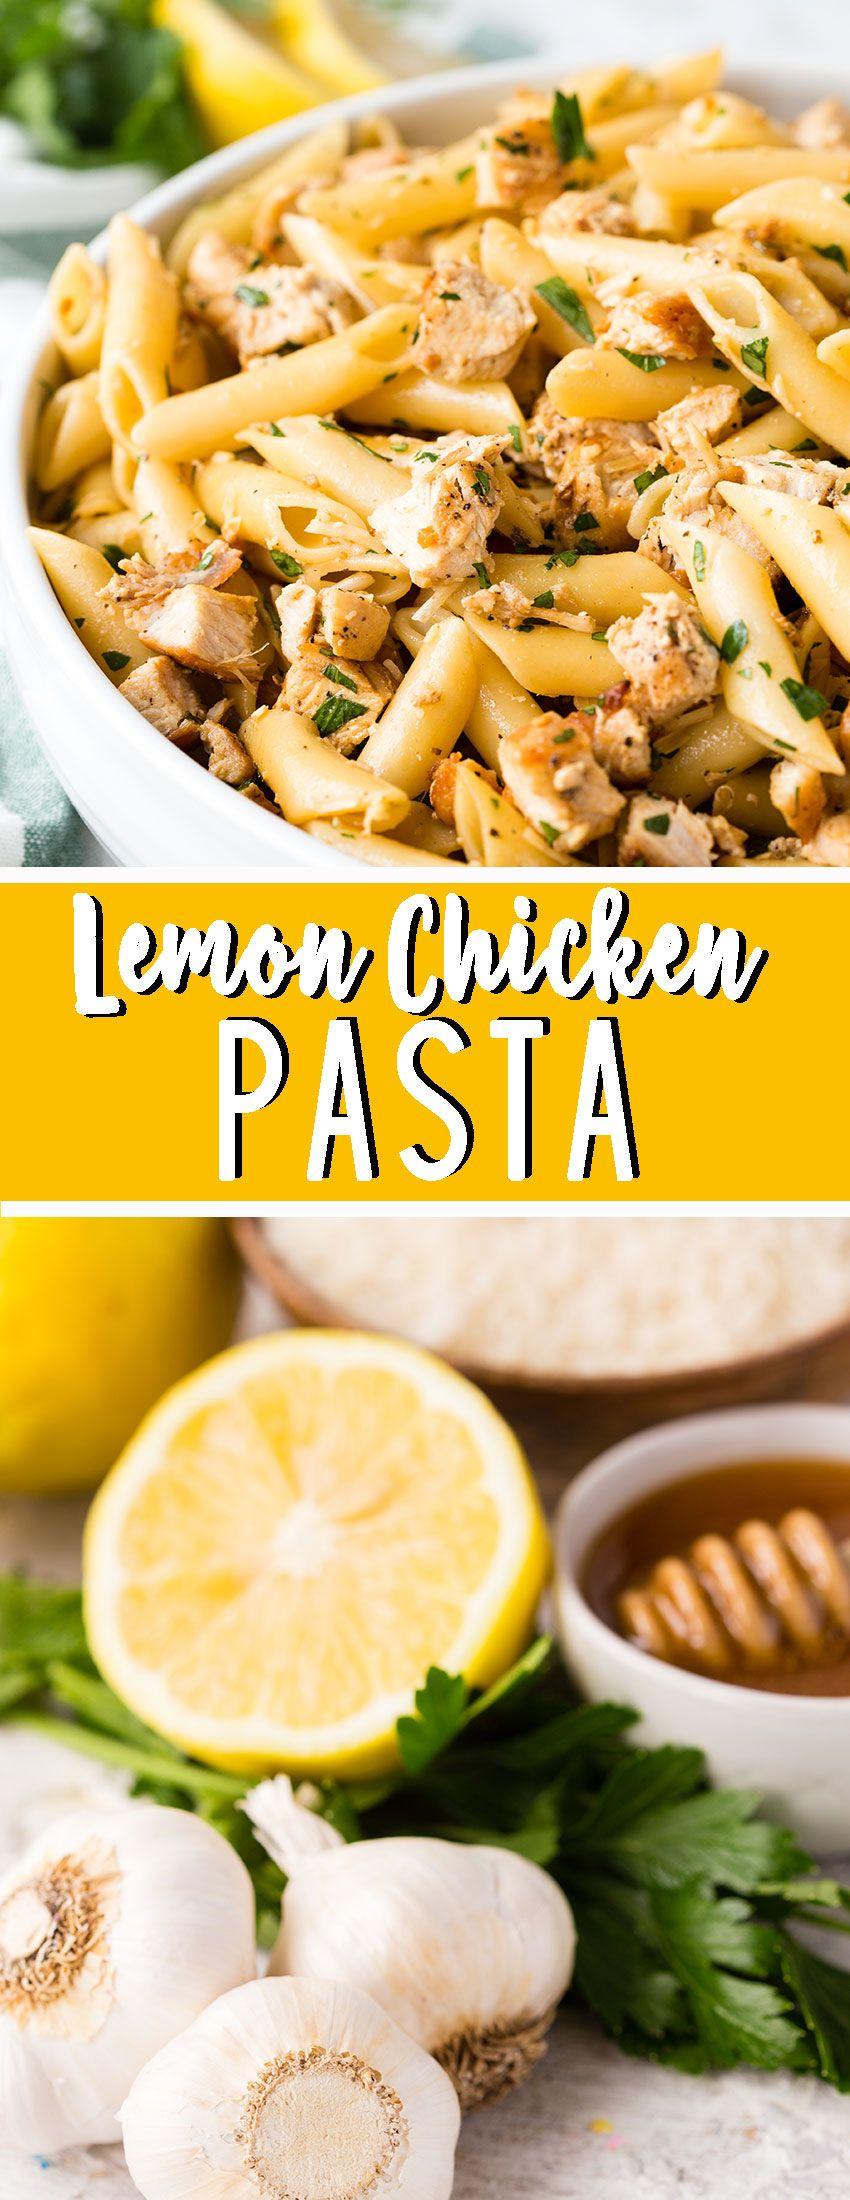 Lemon Chicken Pasta images